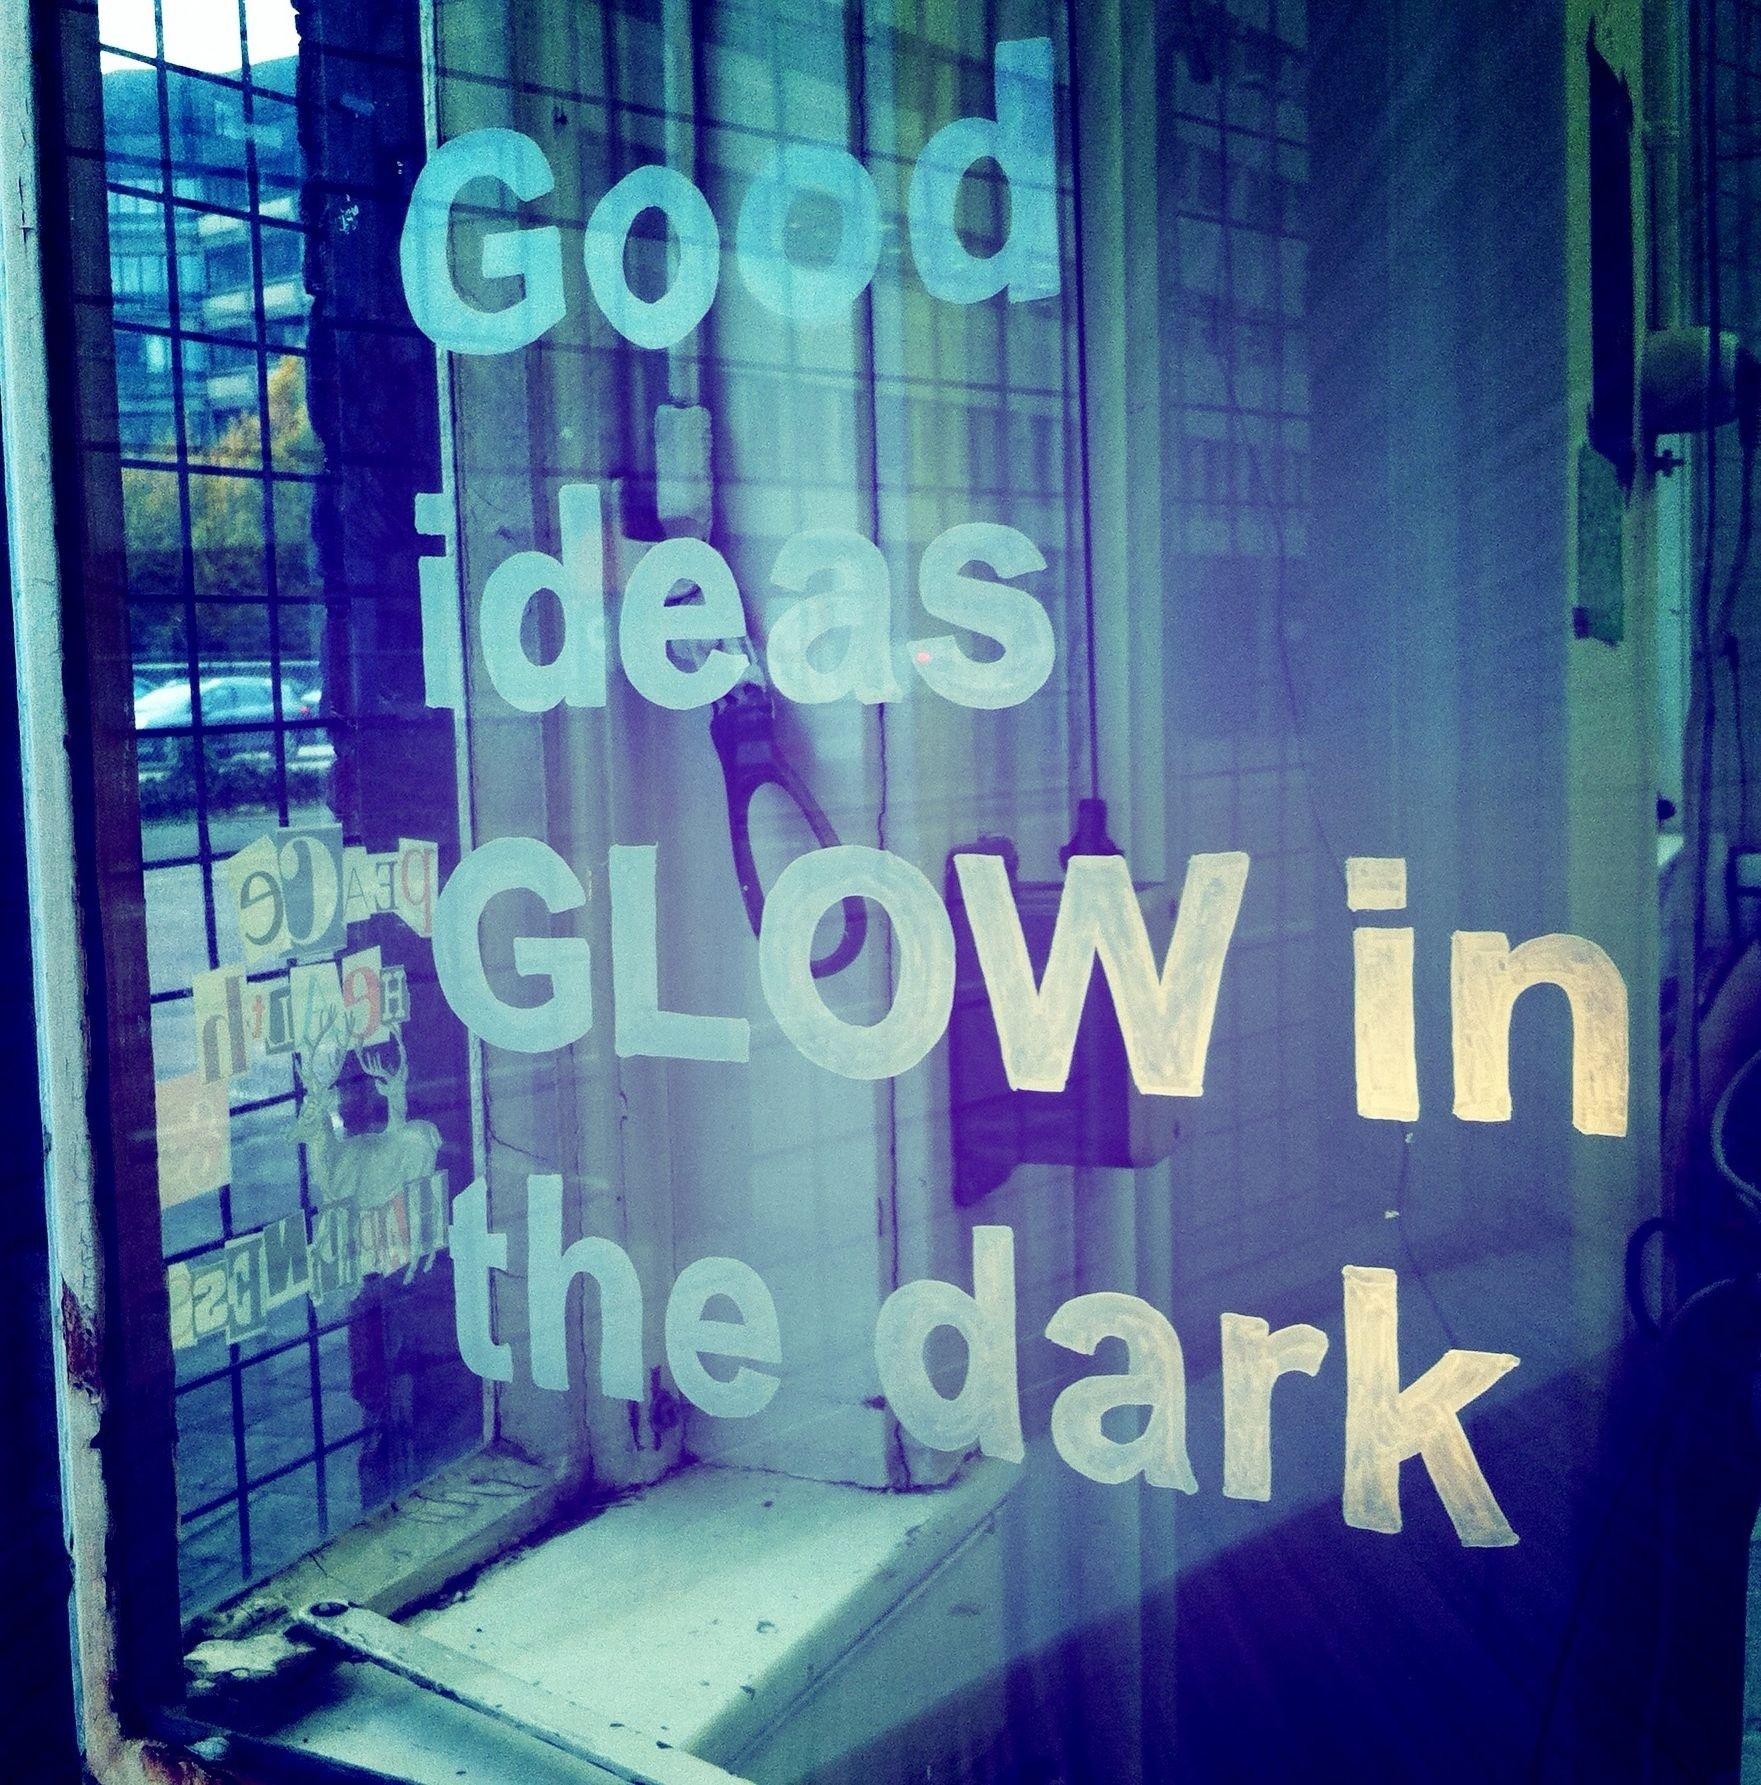 10 Fashionable Good Ideas Glow In The Dark good ideas glow in the dark tuesday window quote 13 11 2012 2020